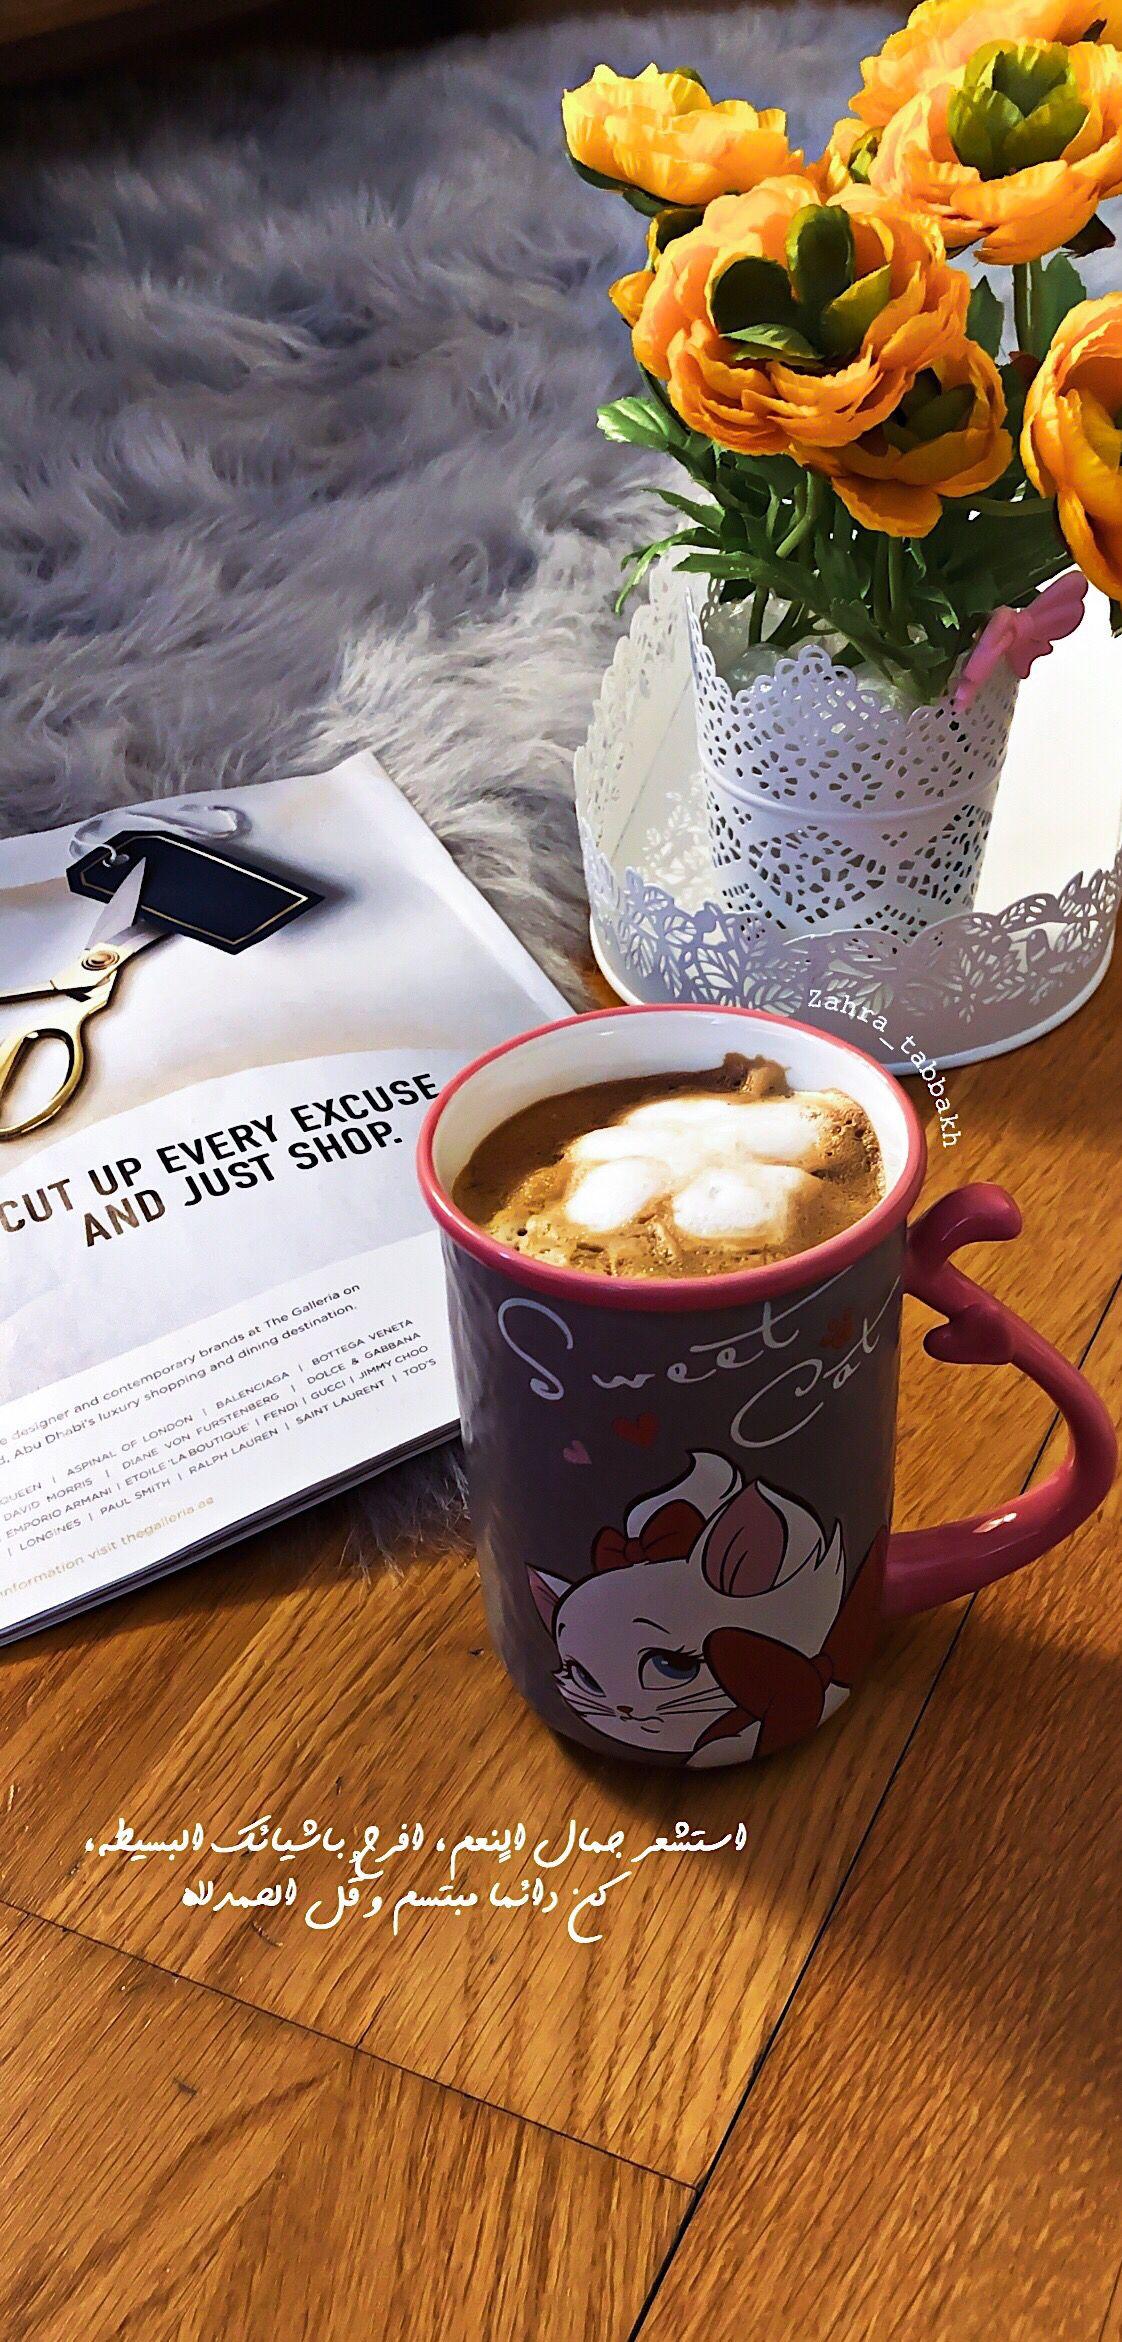 كن دائما مبتسم و ق ل الحمدلله Snap Food Instagram Photo Editing Coffee